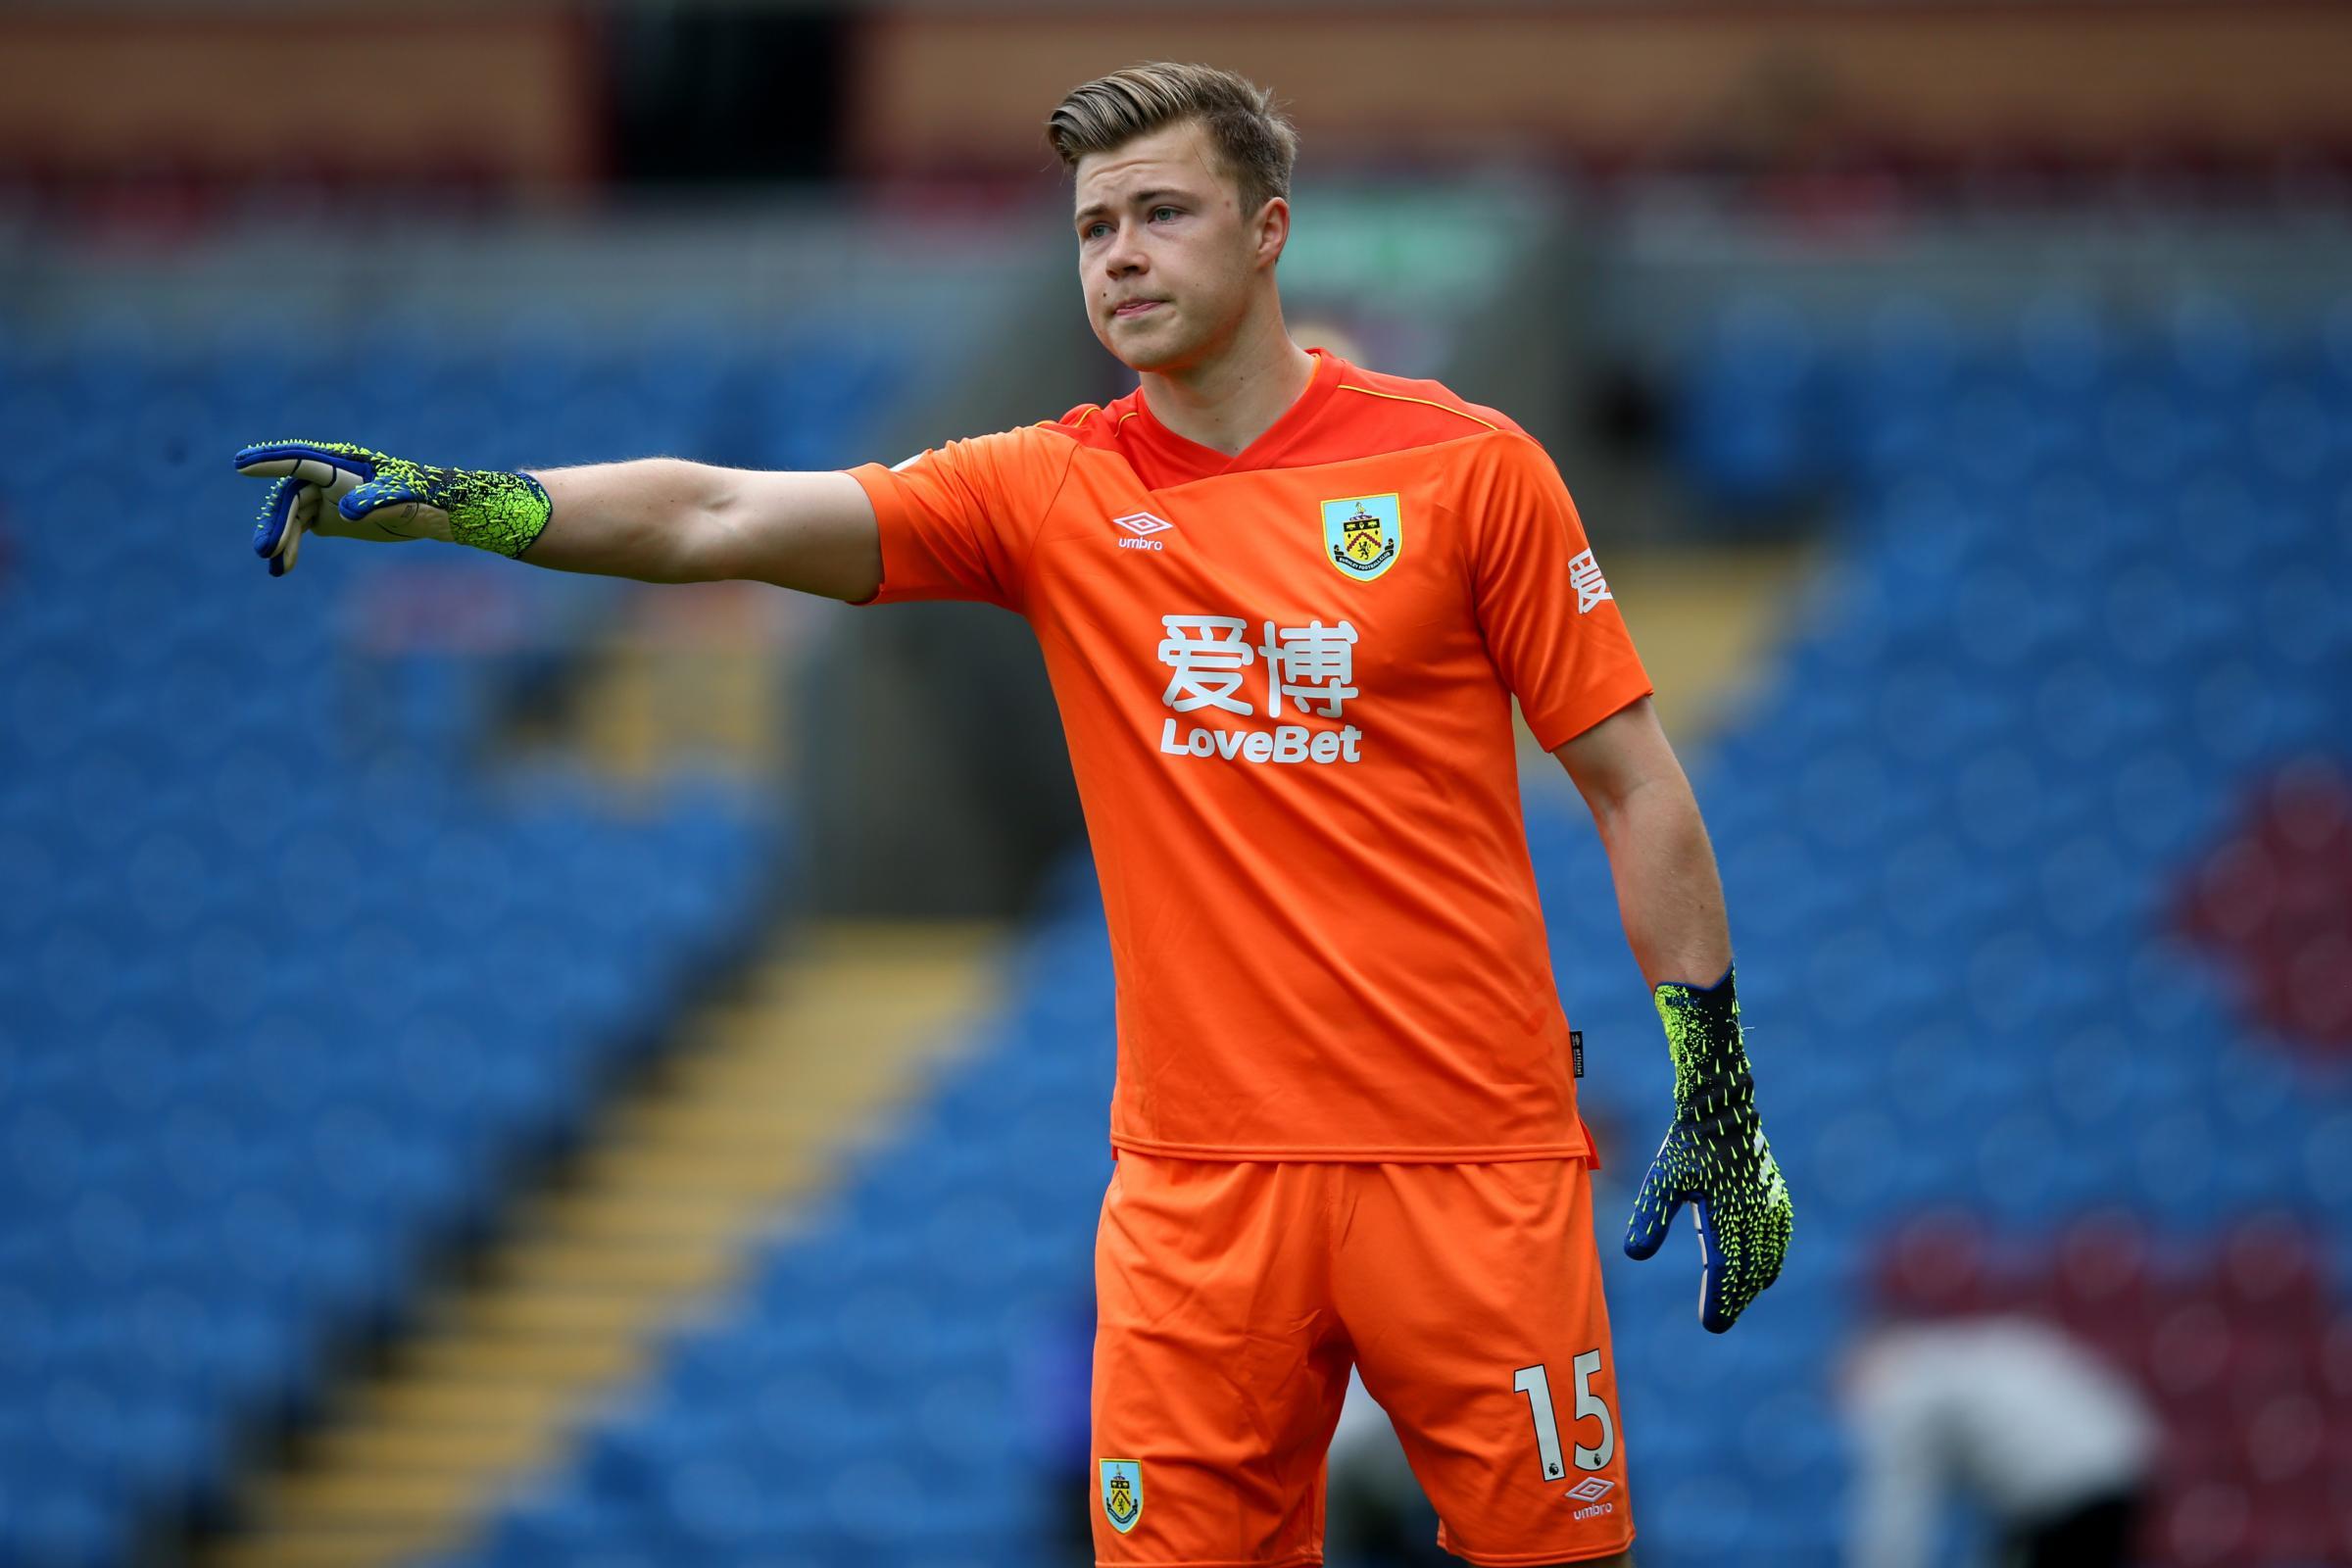 Burnley goalkeeper signs season-long deal at Sheffield Wednesday